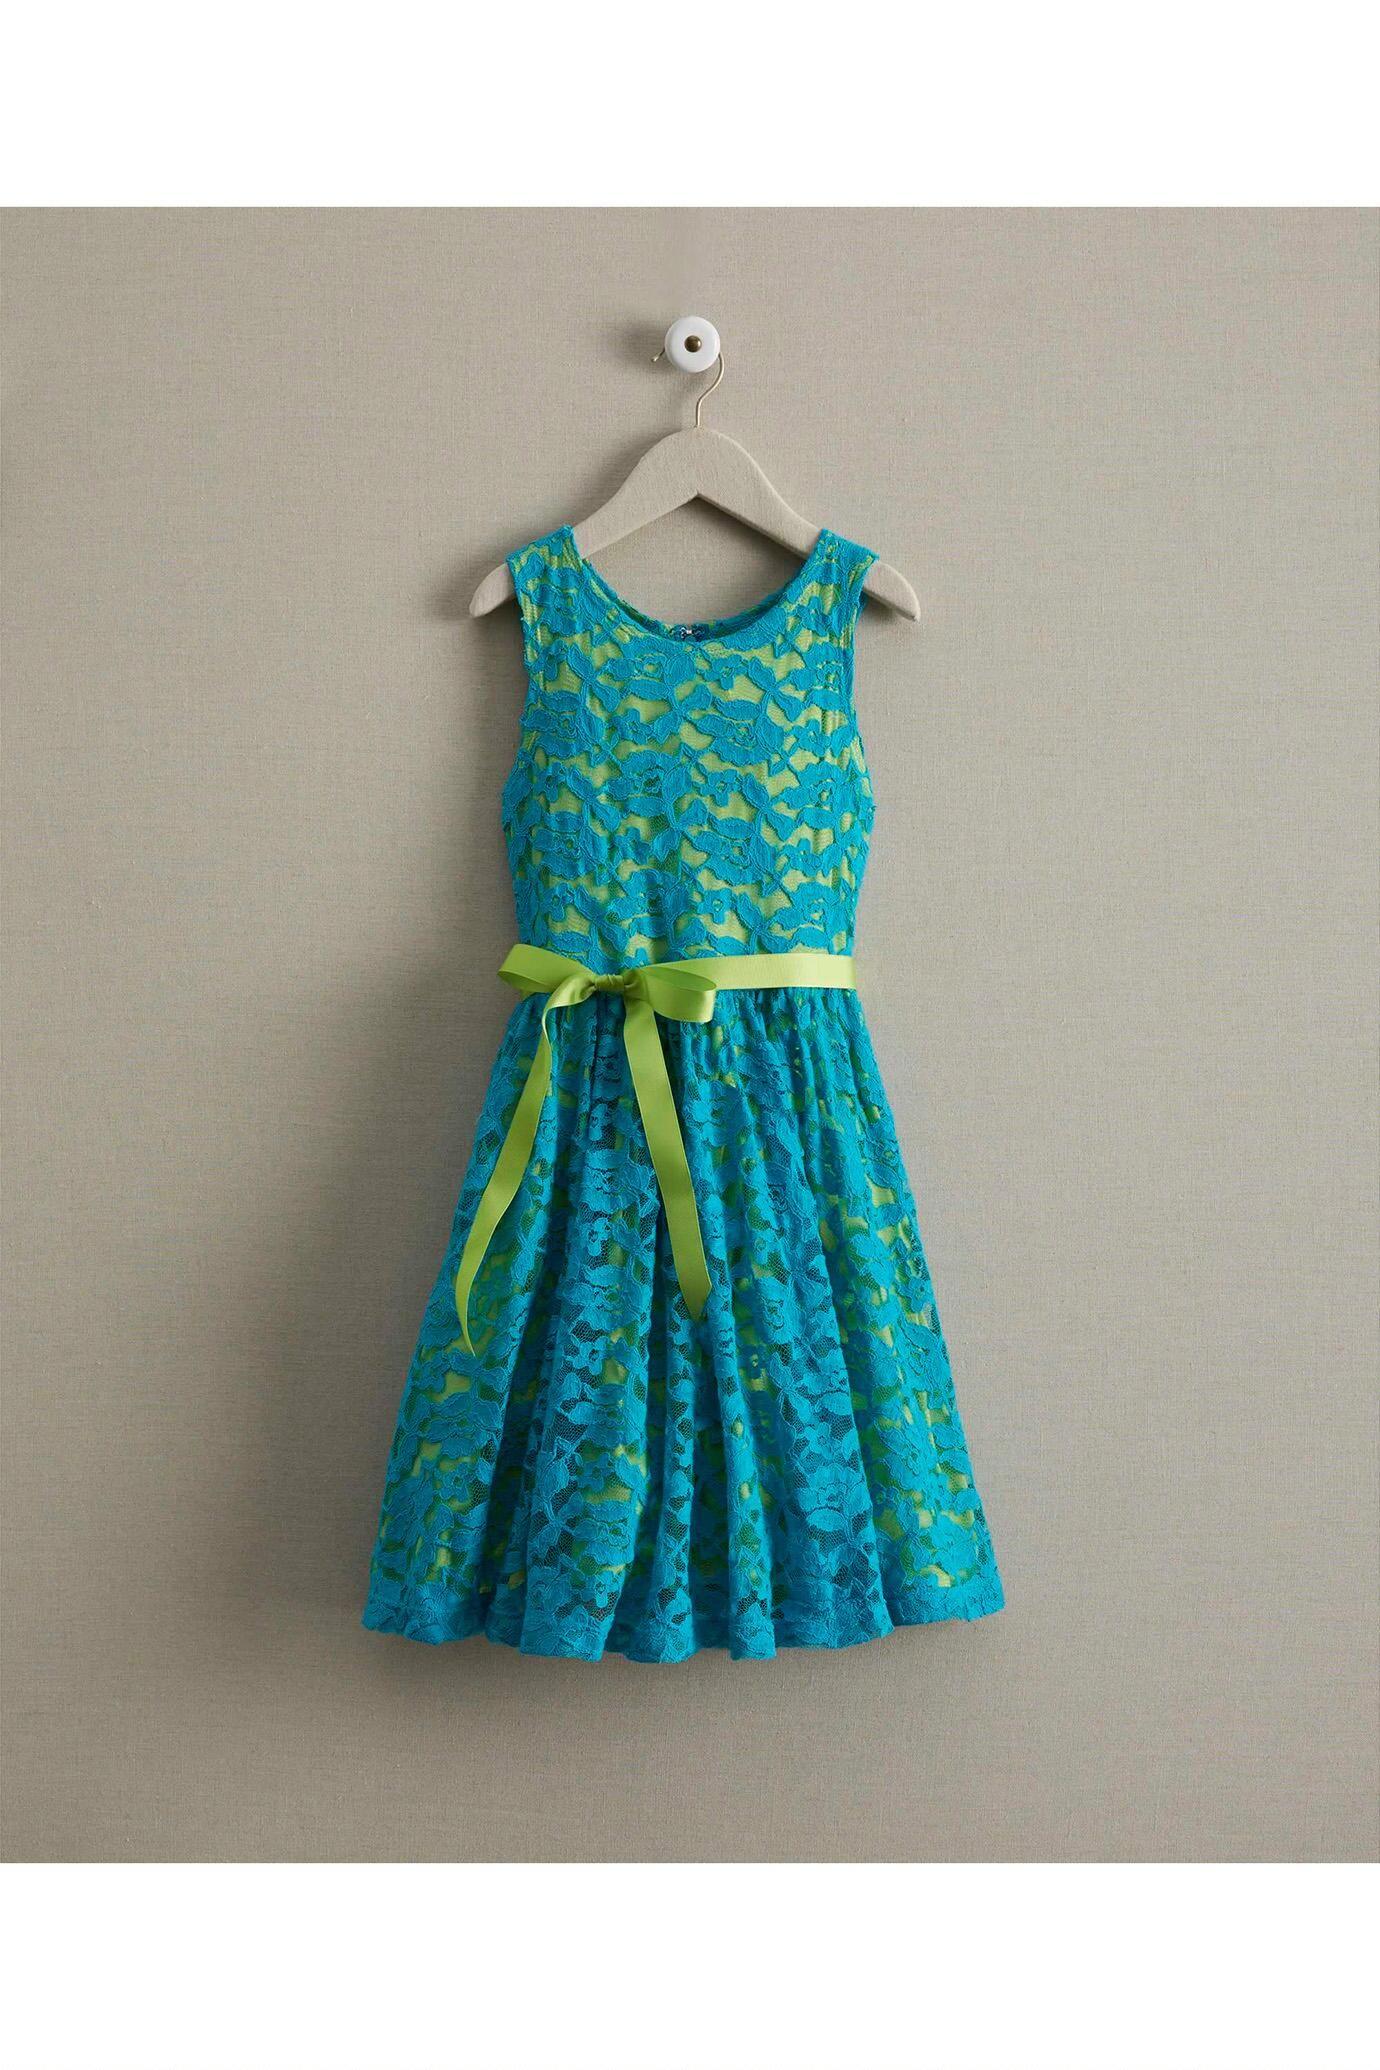 Girls Turquoise Lace Dress: #Chasingfireflies $29.97 | American Girl ...